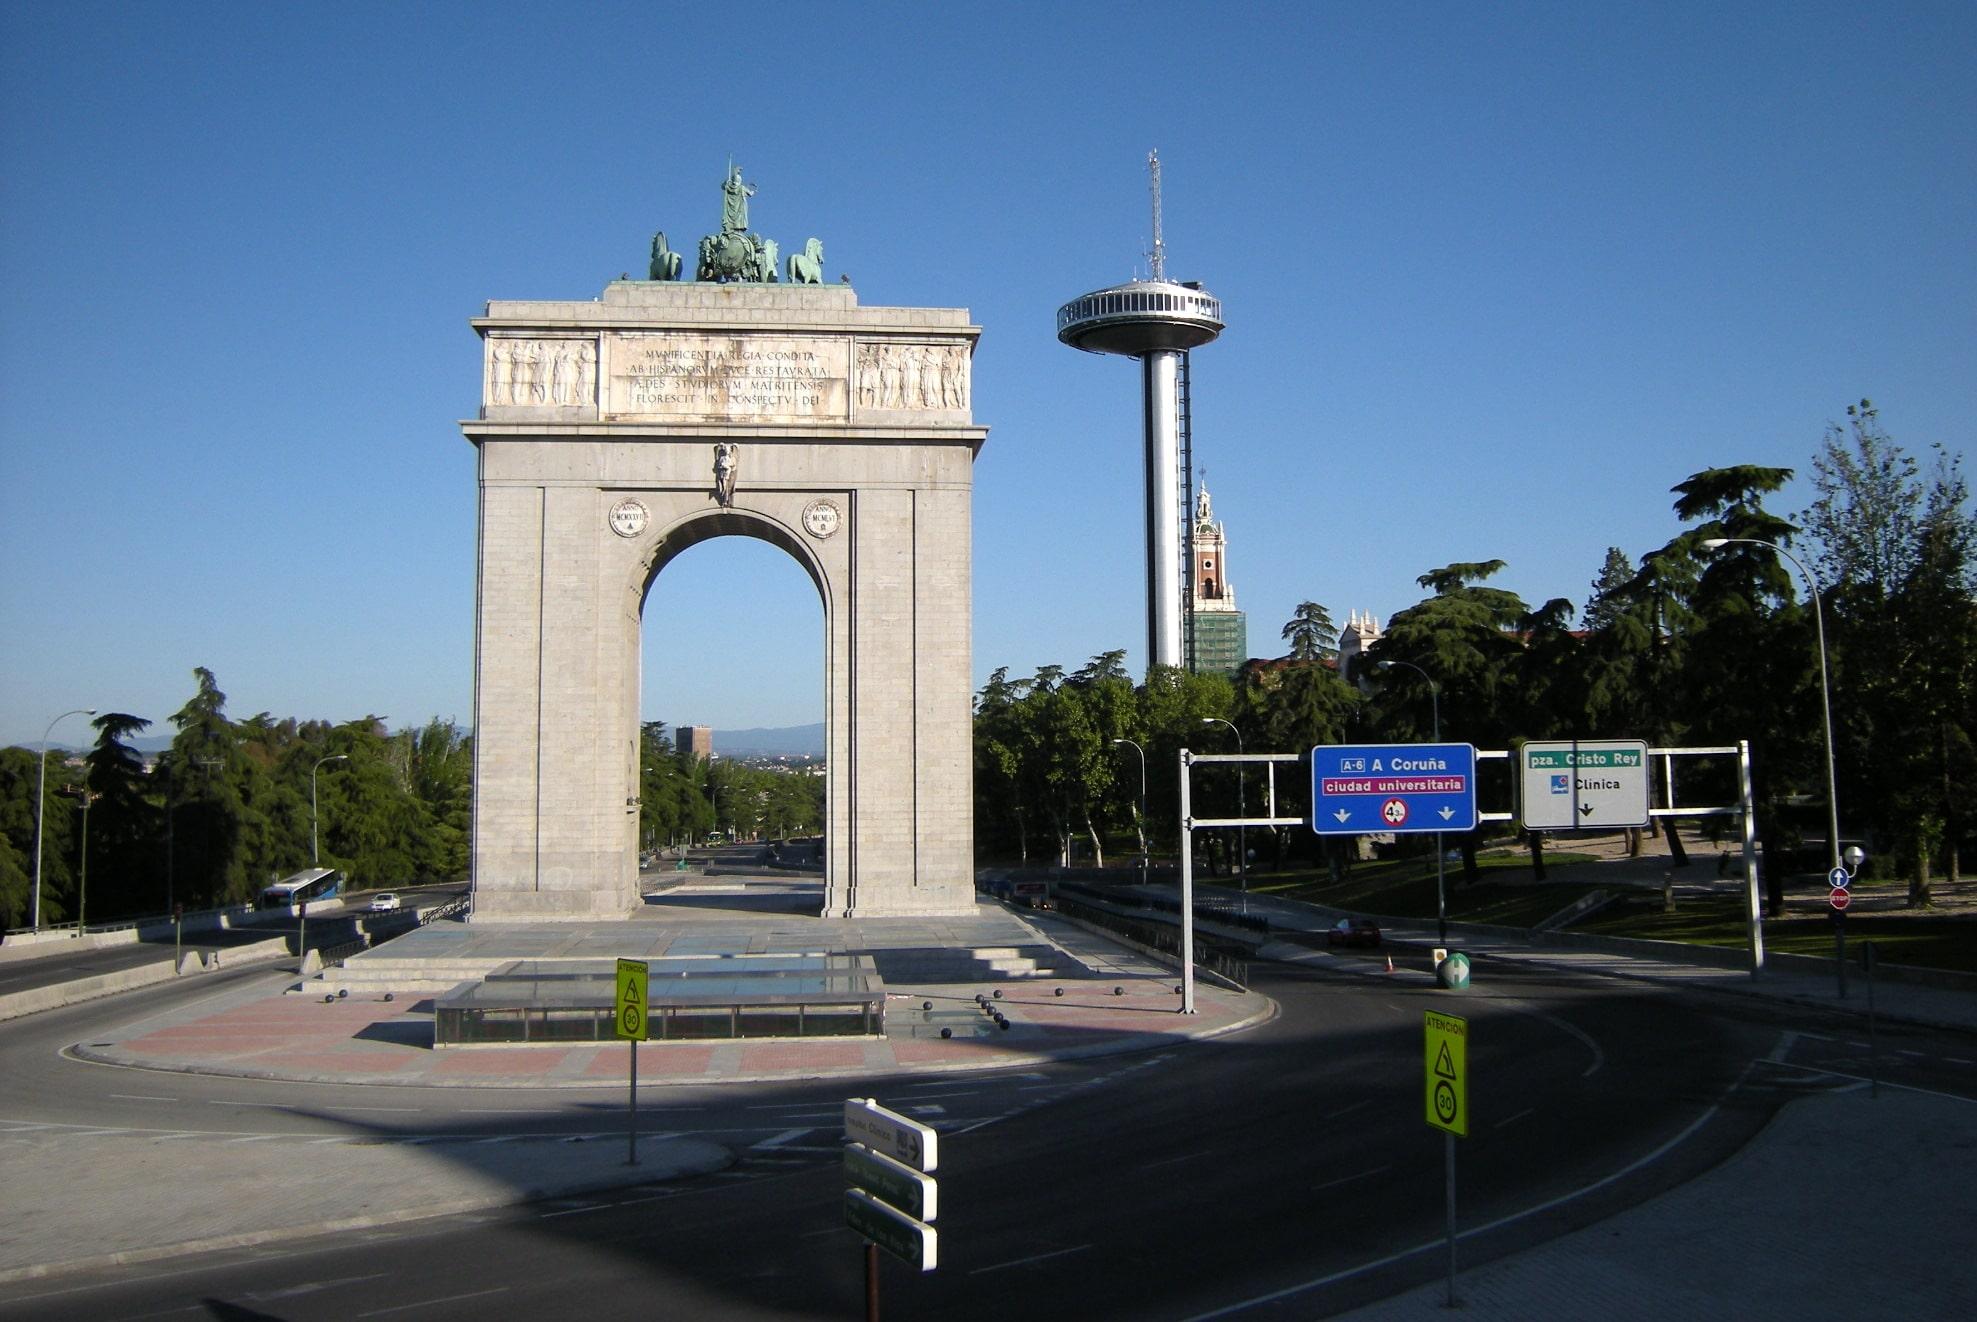 Arco de la Victoria din oraşul Madrid